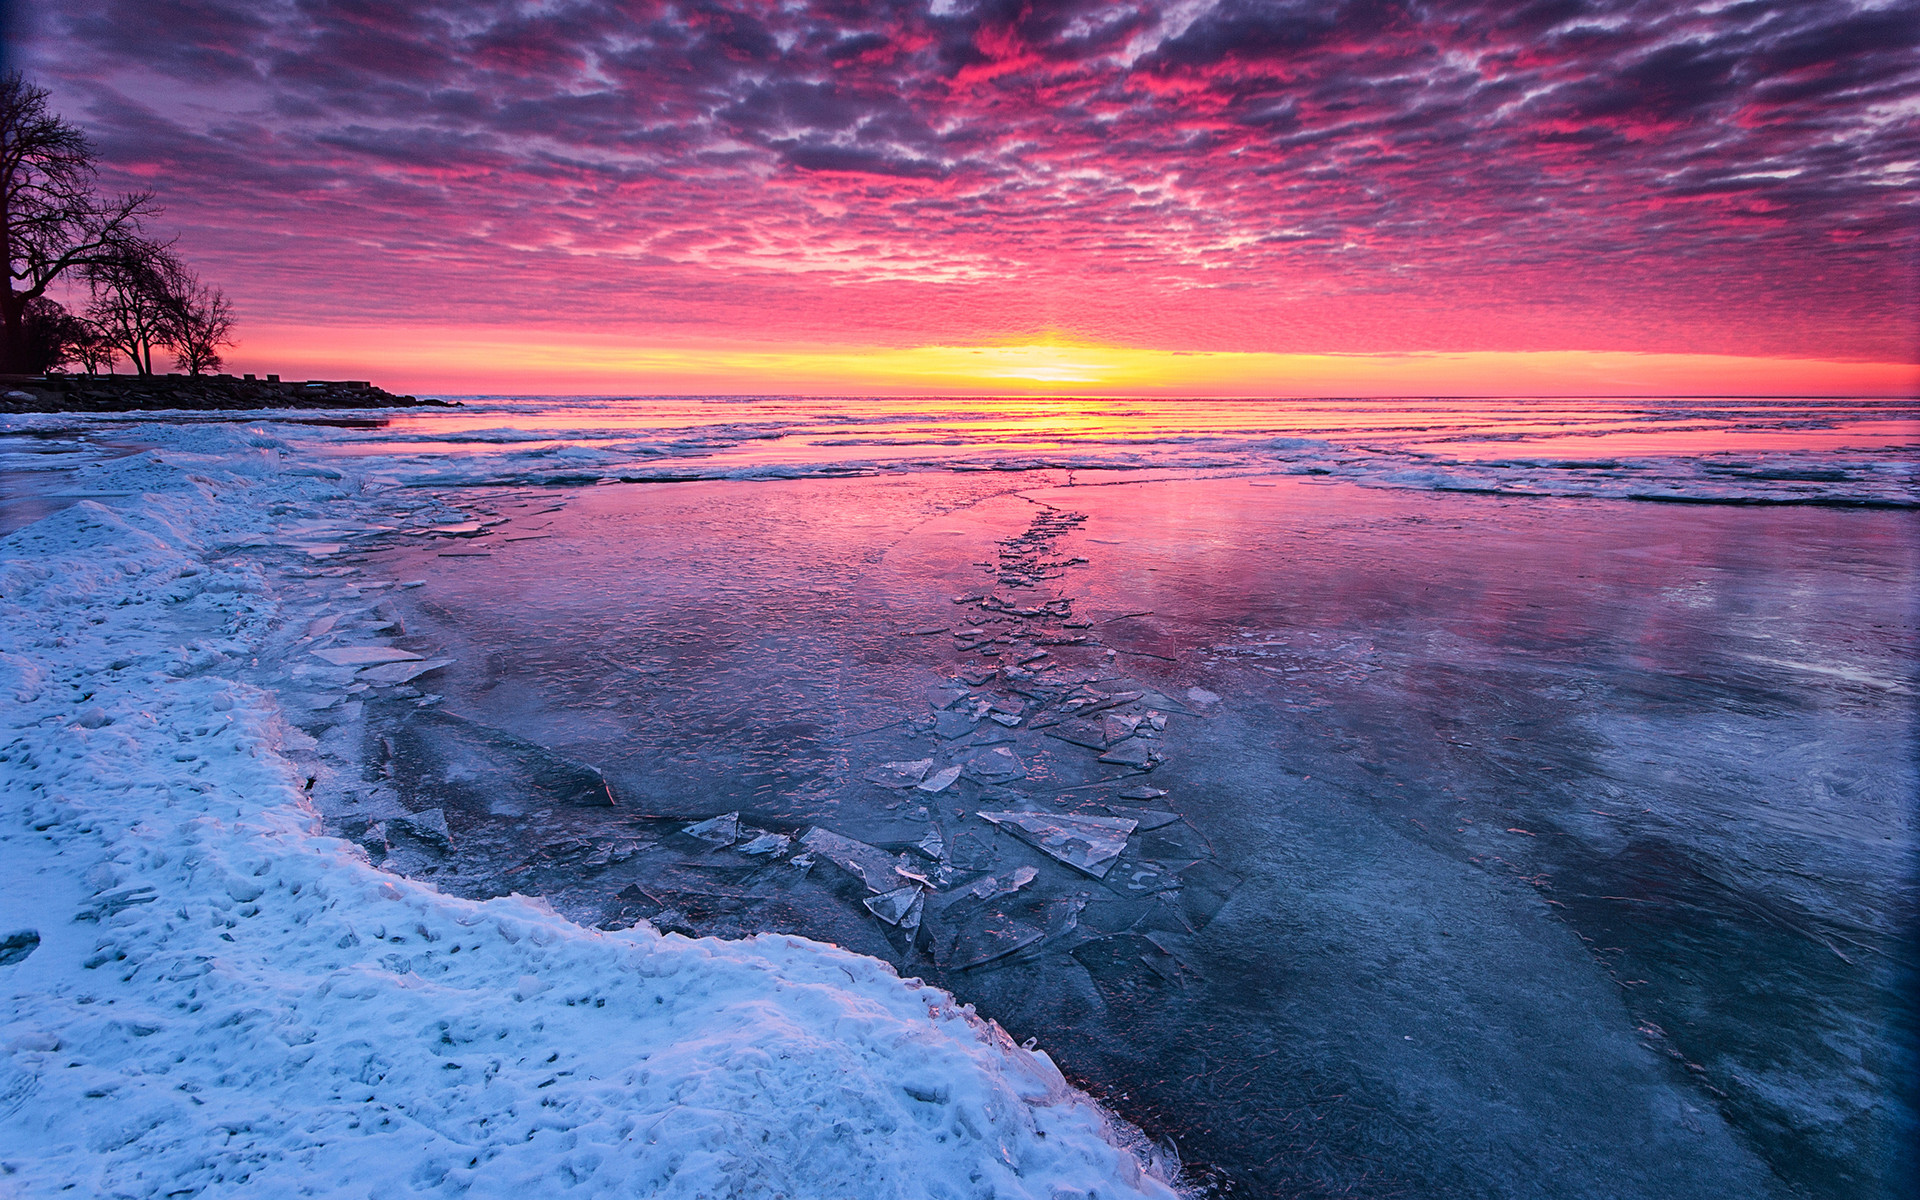 Previous: Beautiful Ice Winter Lake …